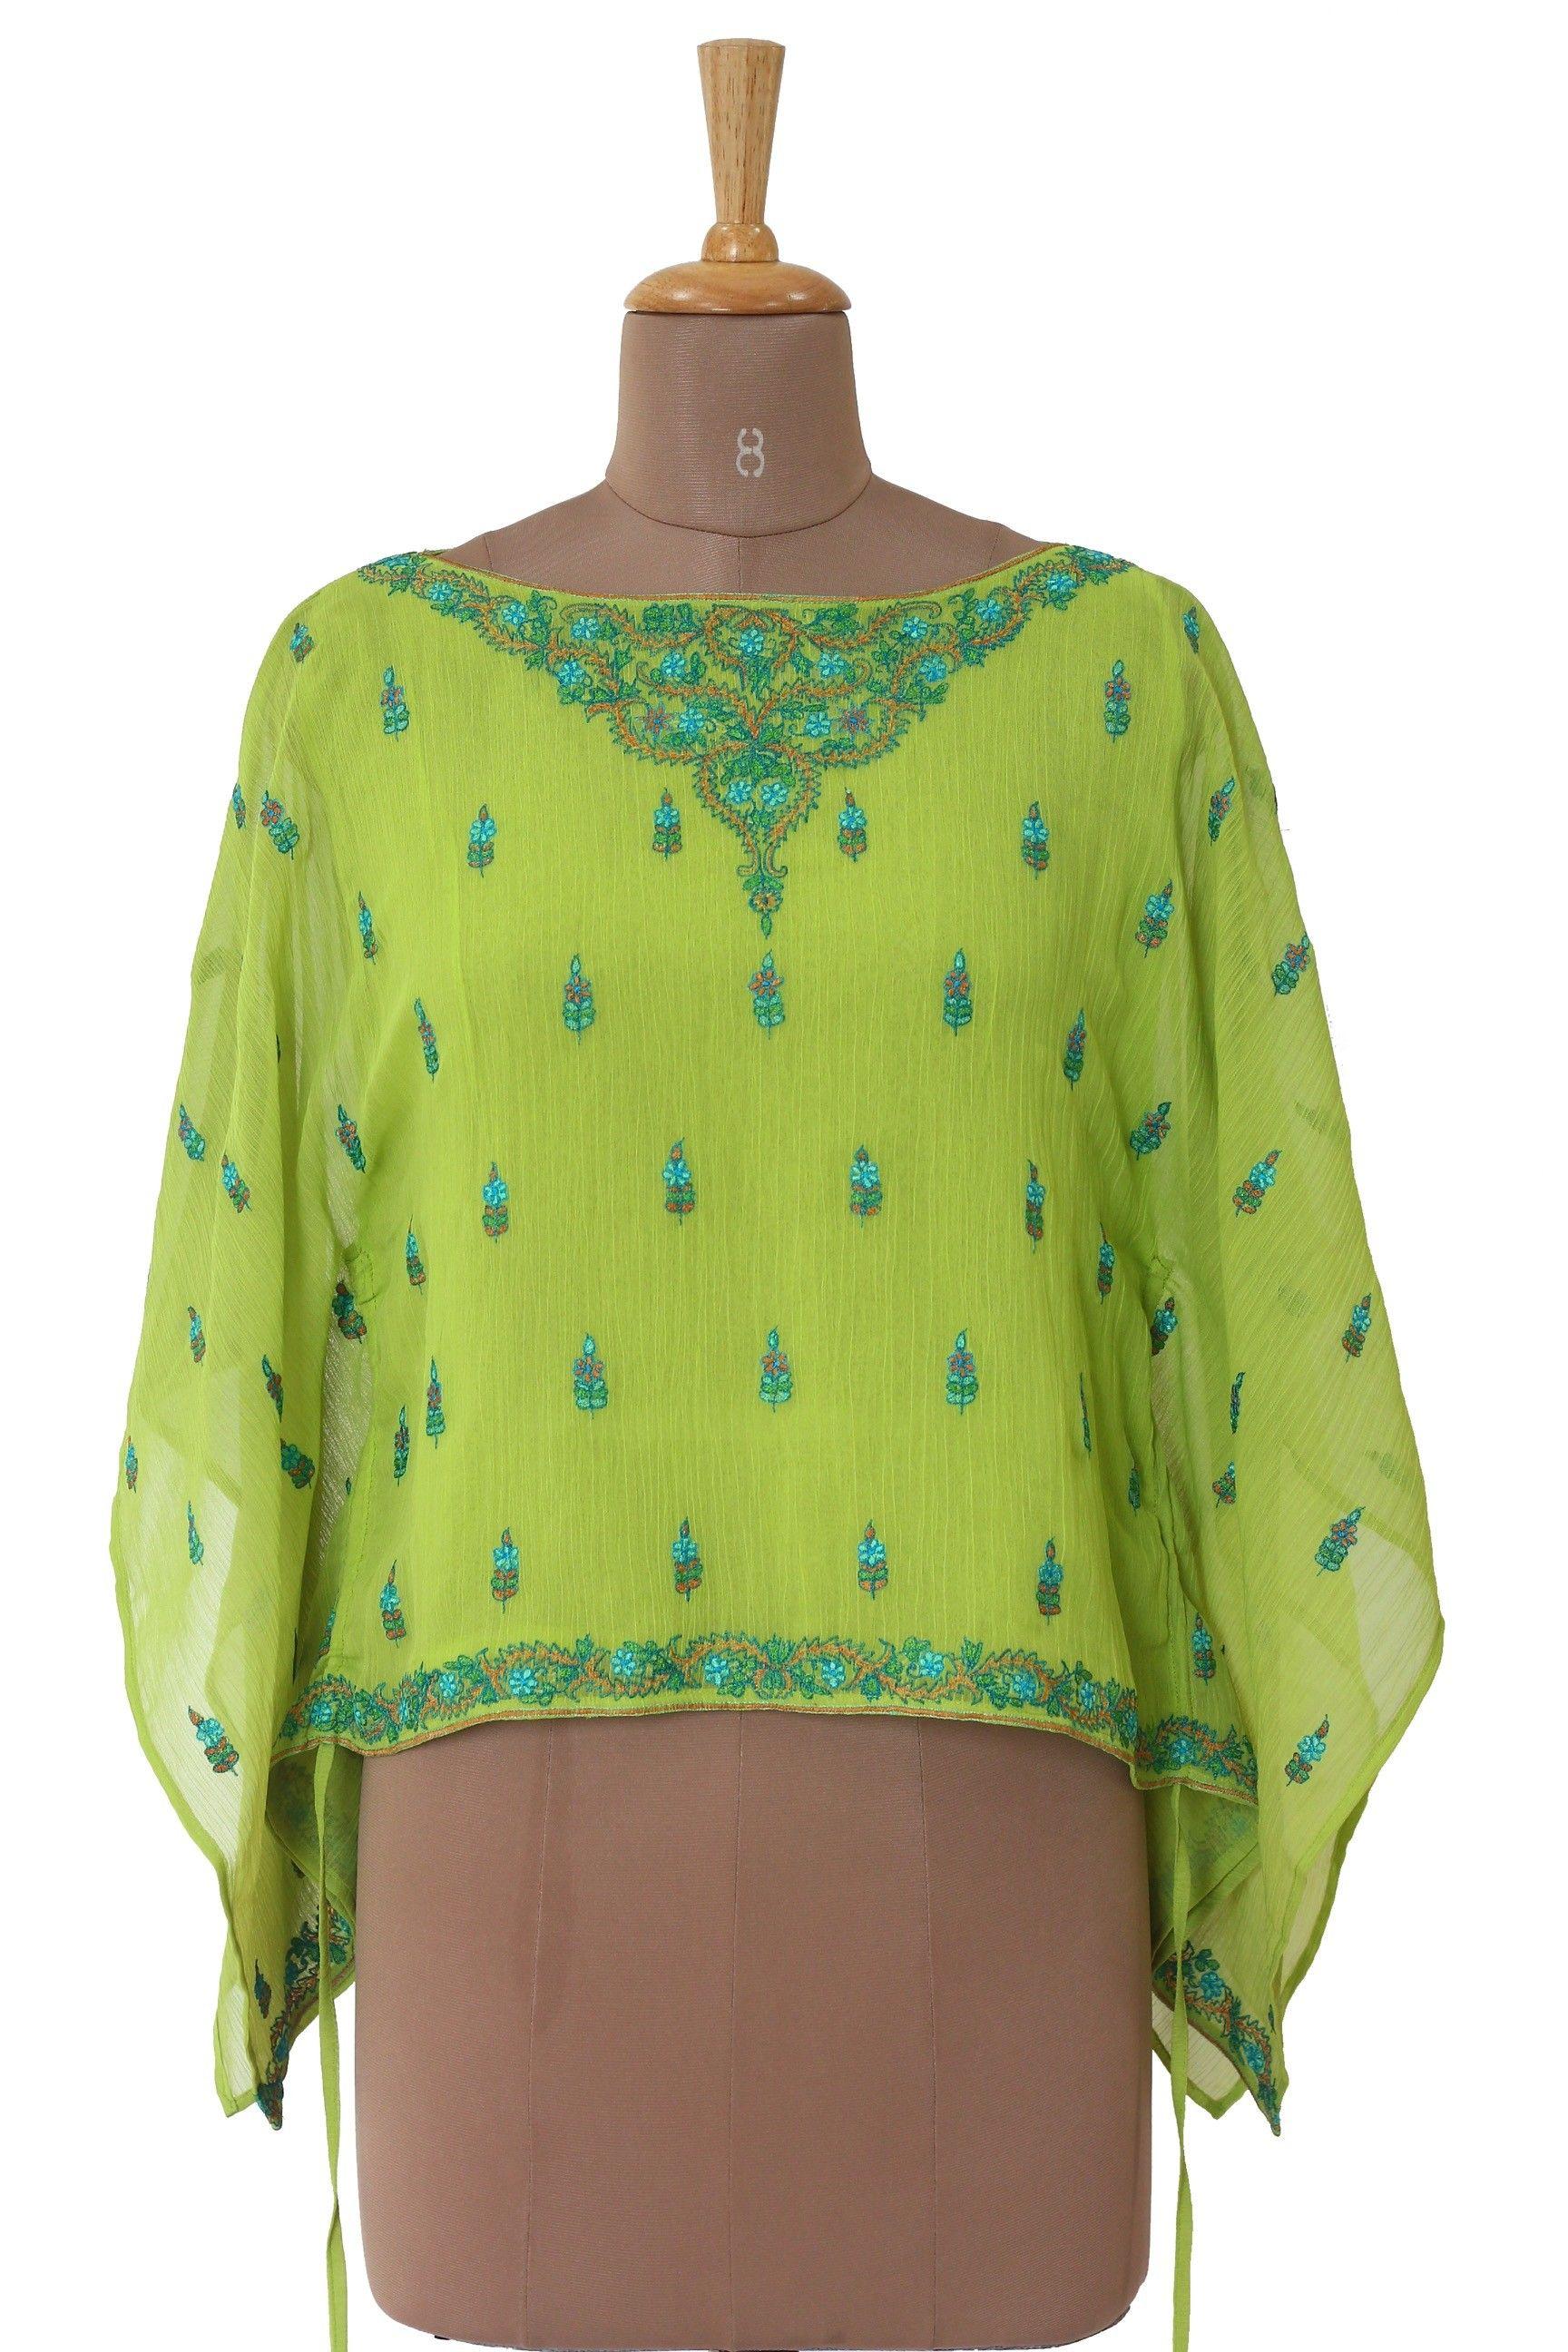 Ritu Kumar Green Top Rs 1,500 (70% Off)